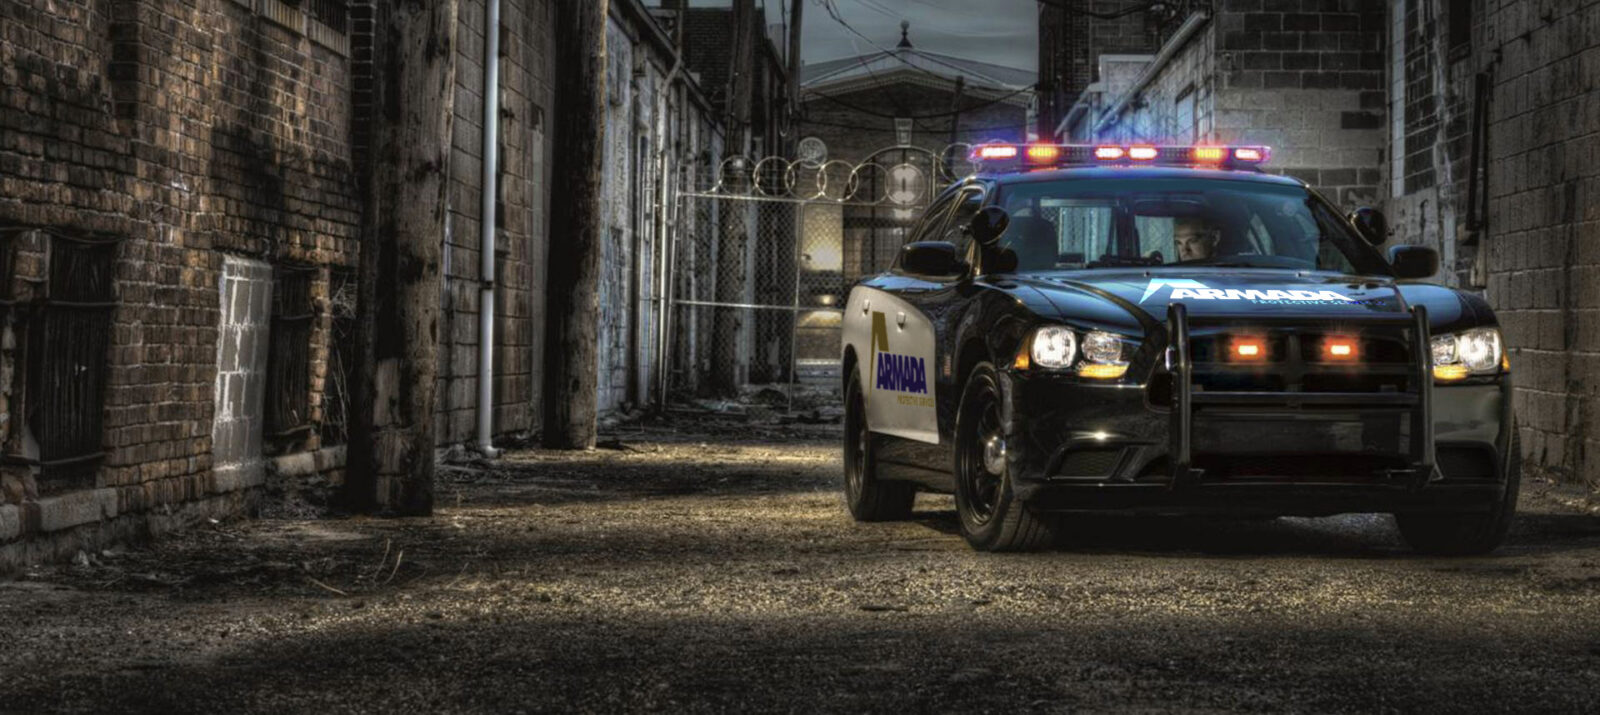 Mobile Security Patrol Devision